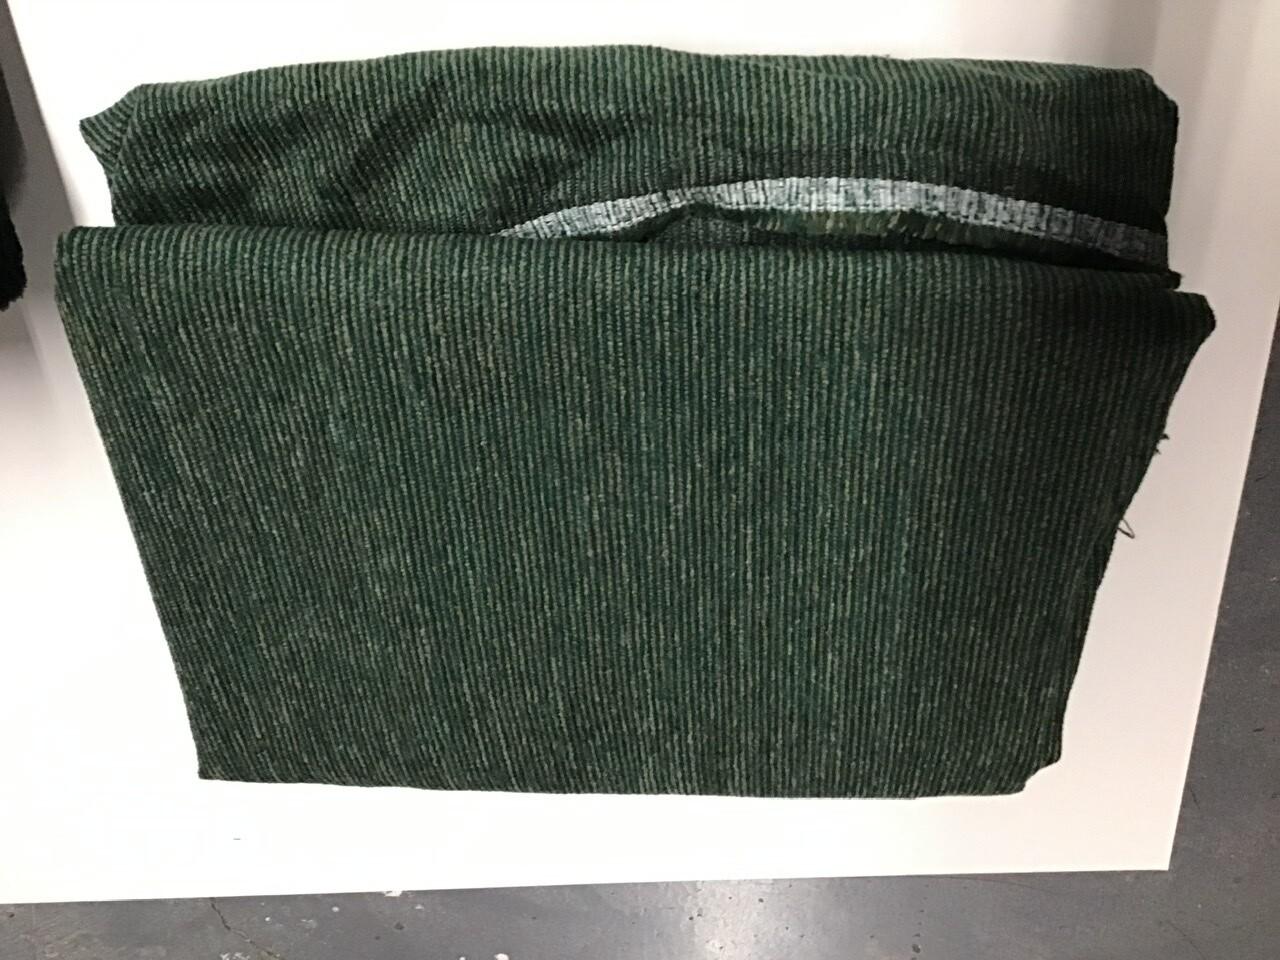 Fabric: Upholstery, in Green/w Tan